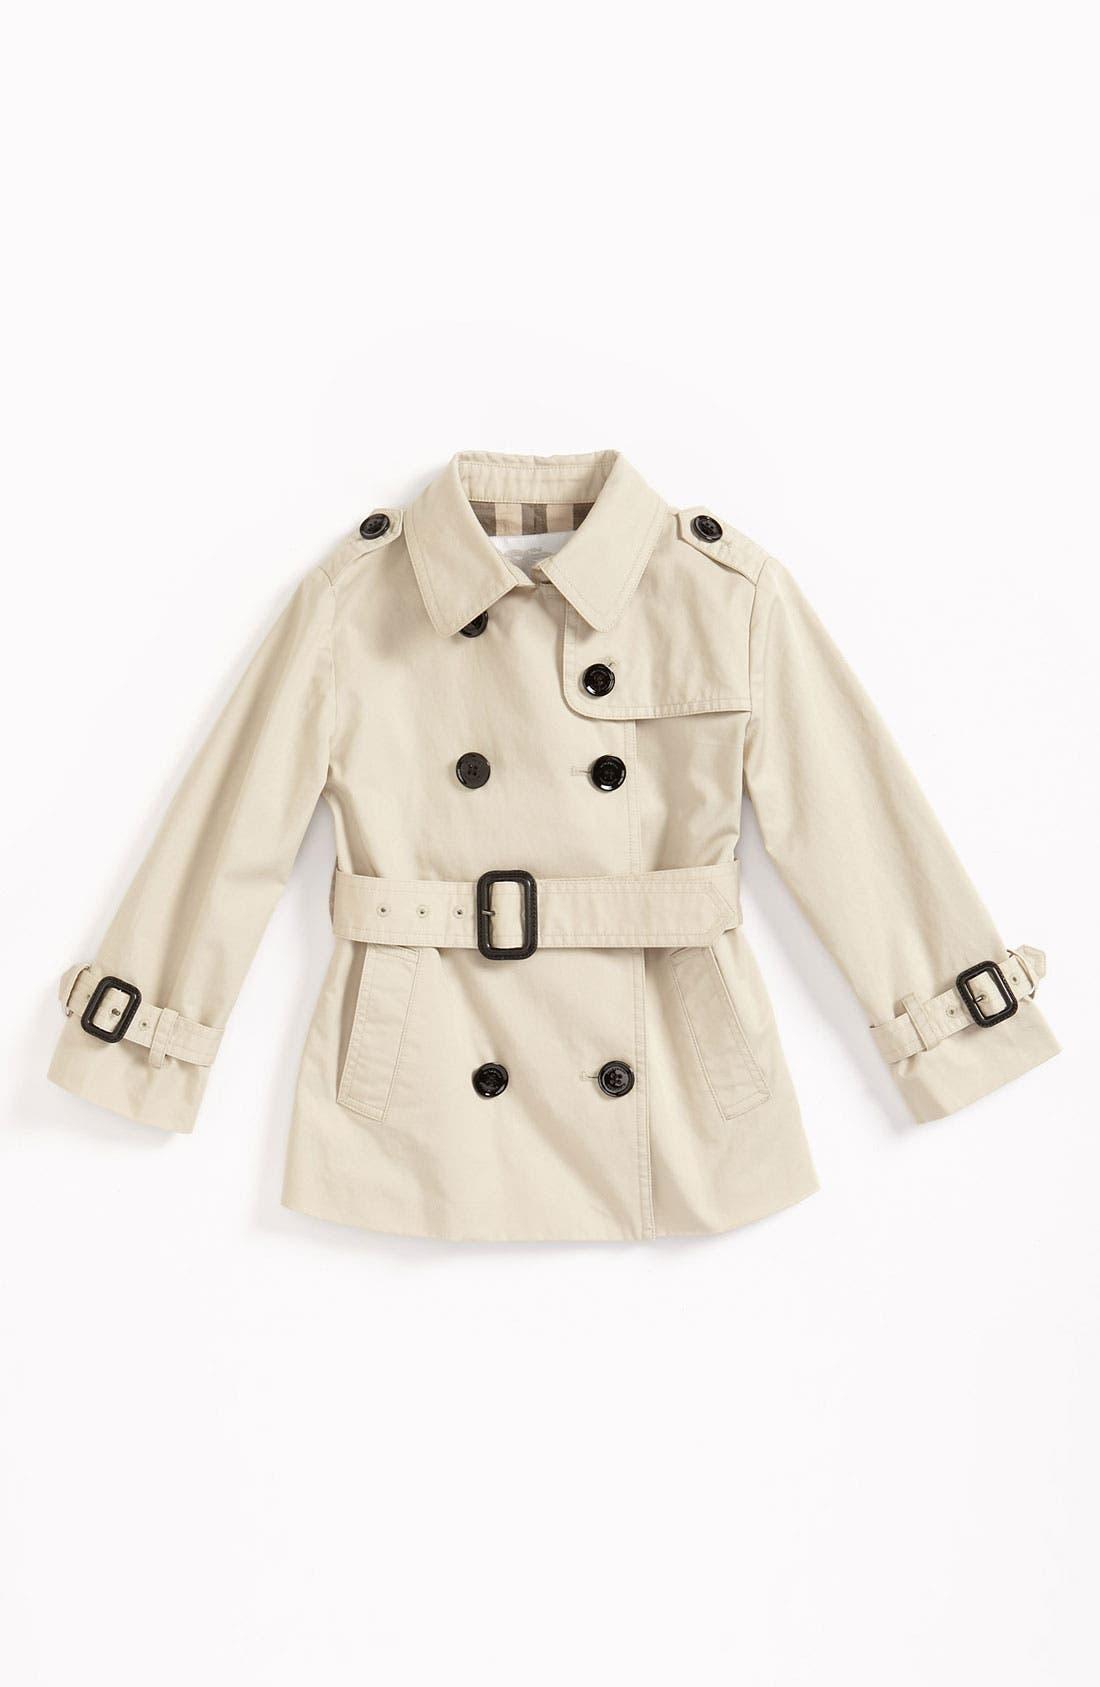 Main Image - Burberry Belted Jacket (Toddler)